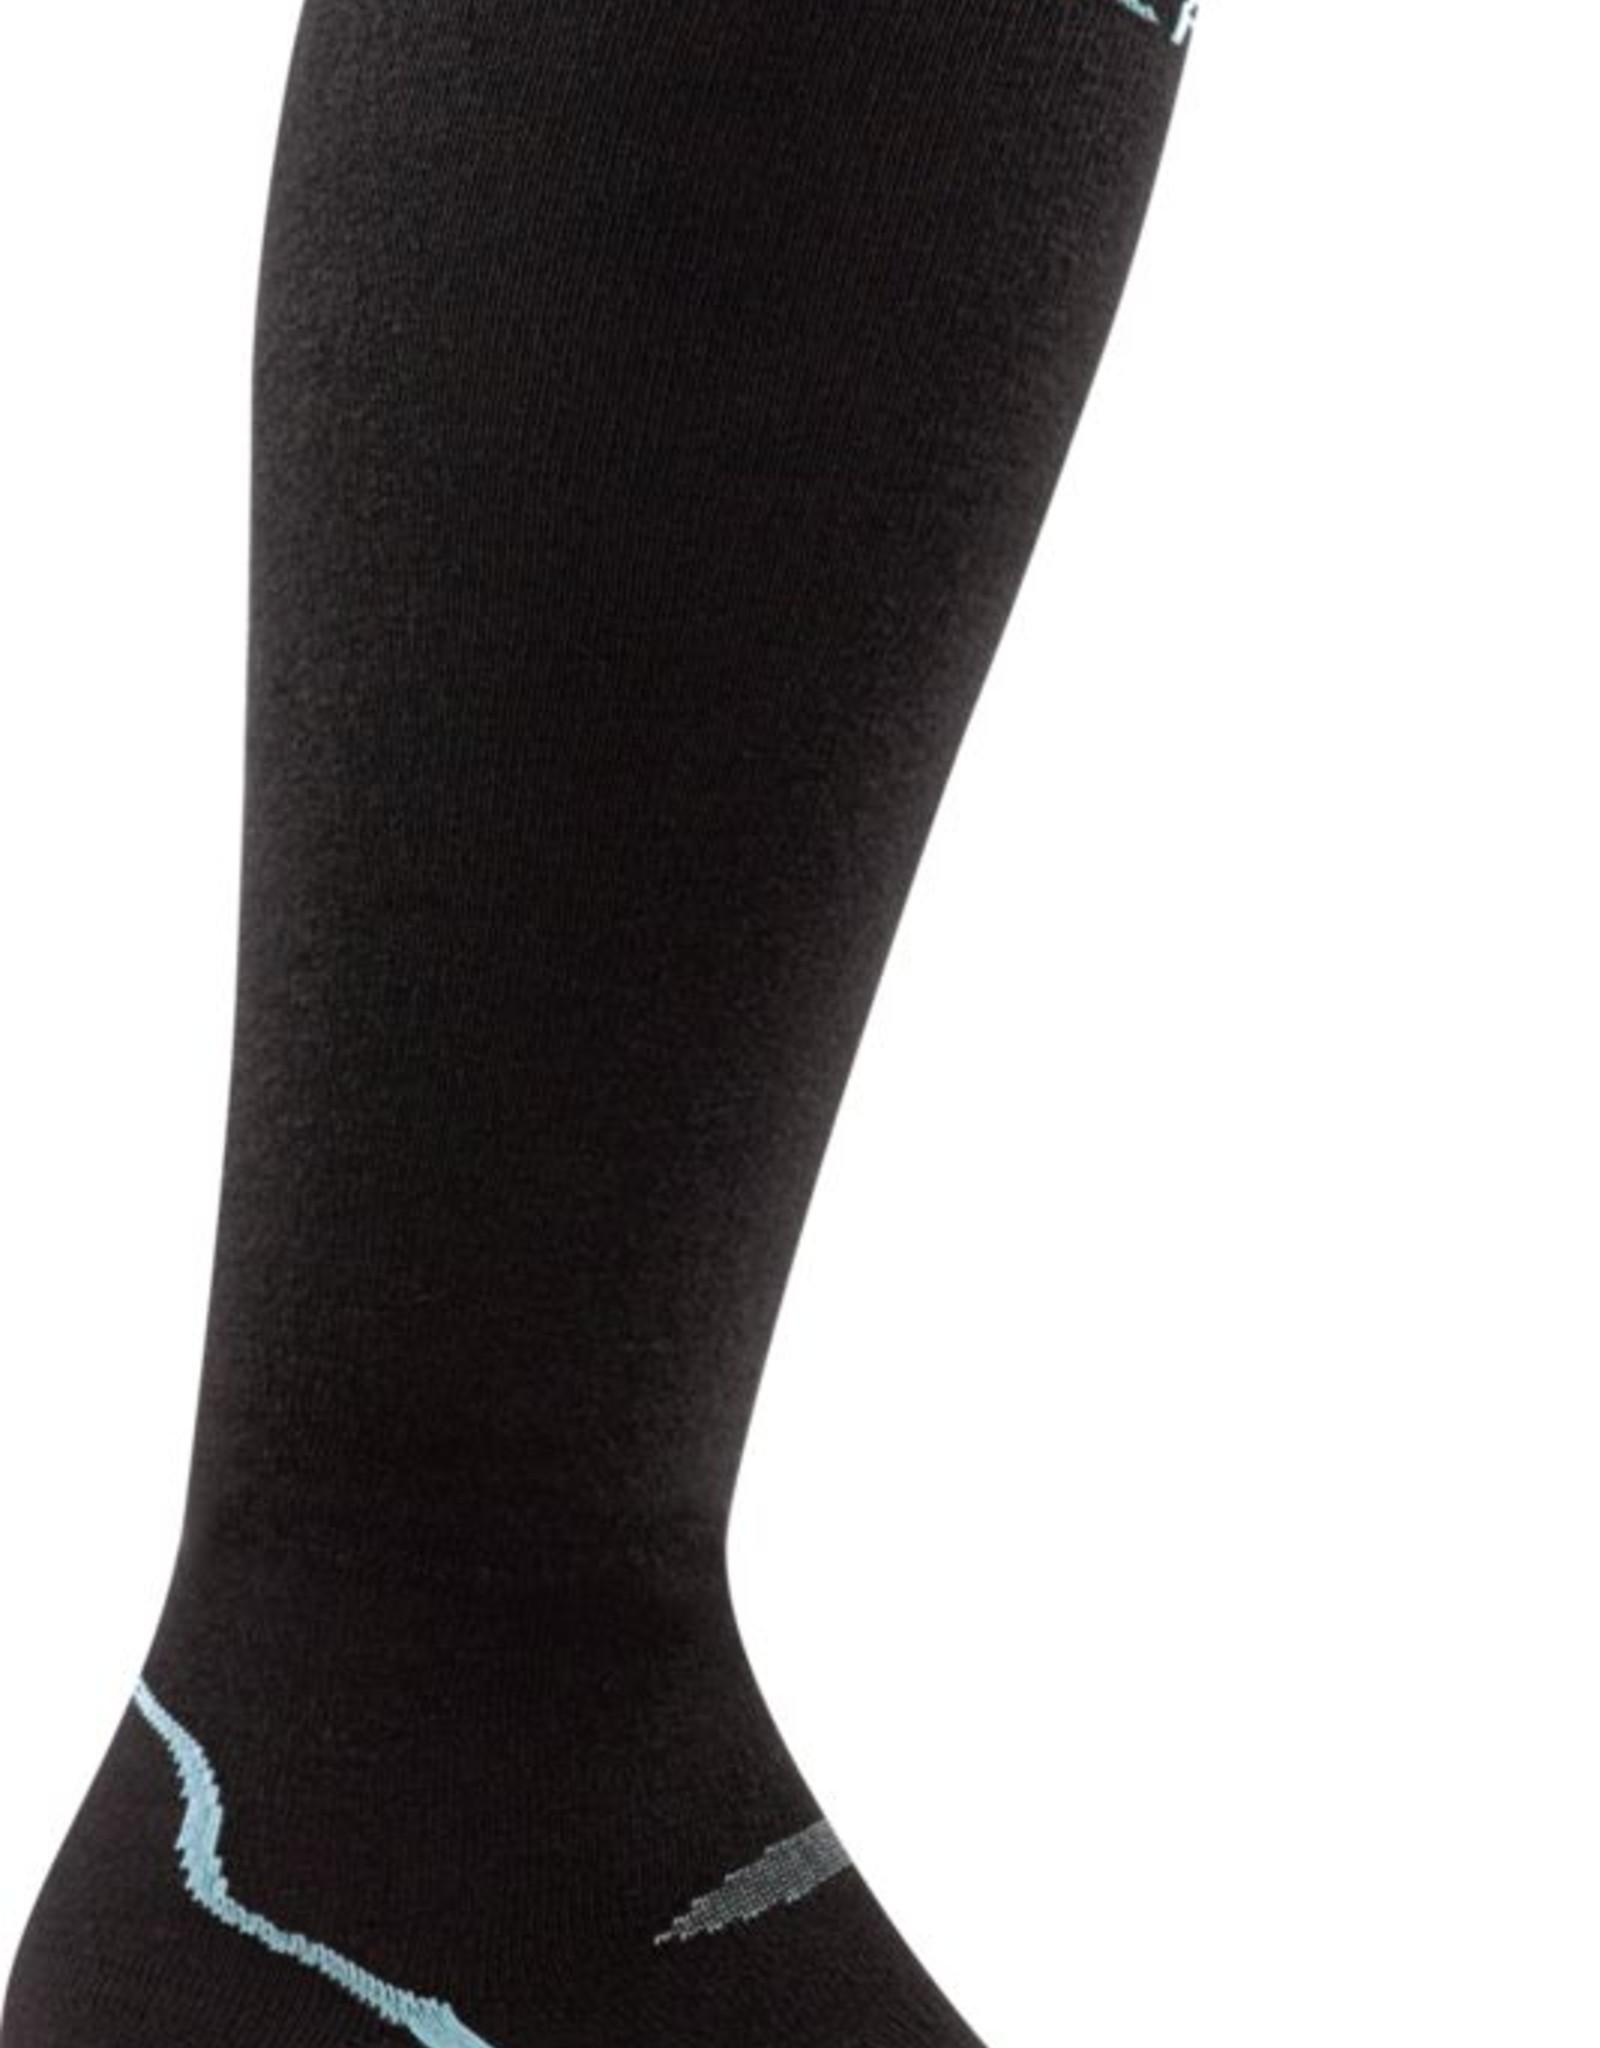 Darn Tough Thermolite Ultralight Sock